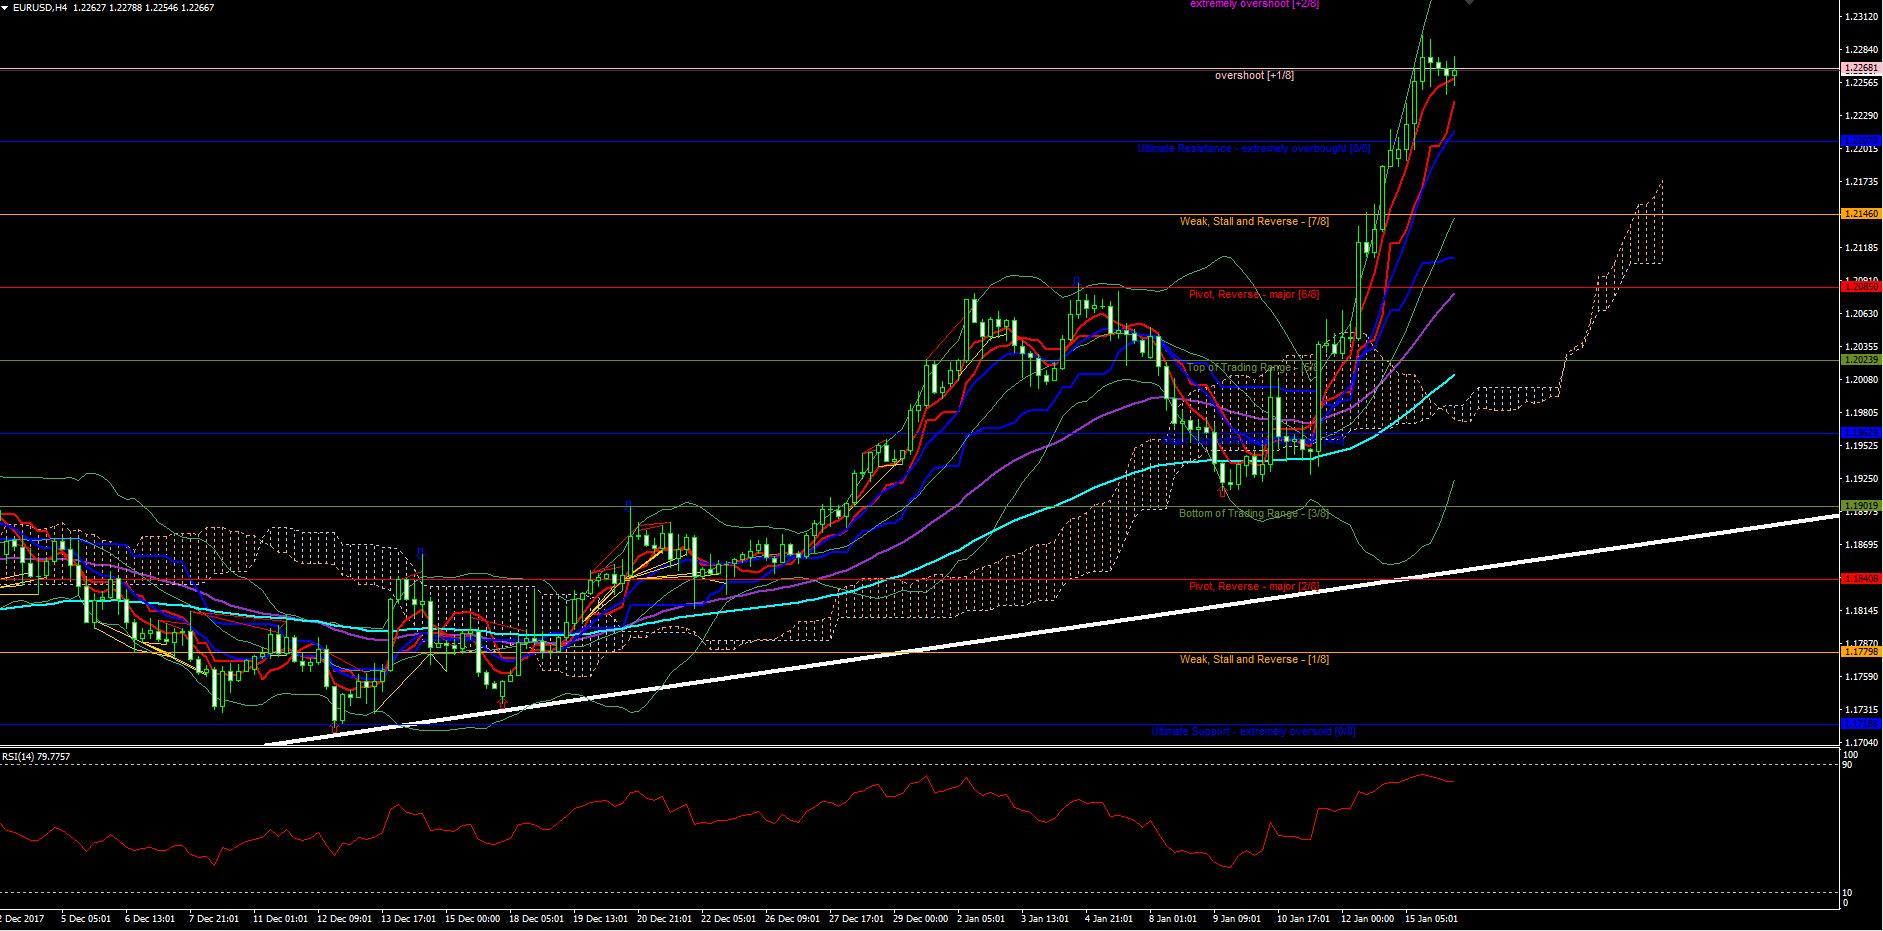 eurusd-h4-chart.png